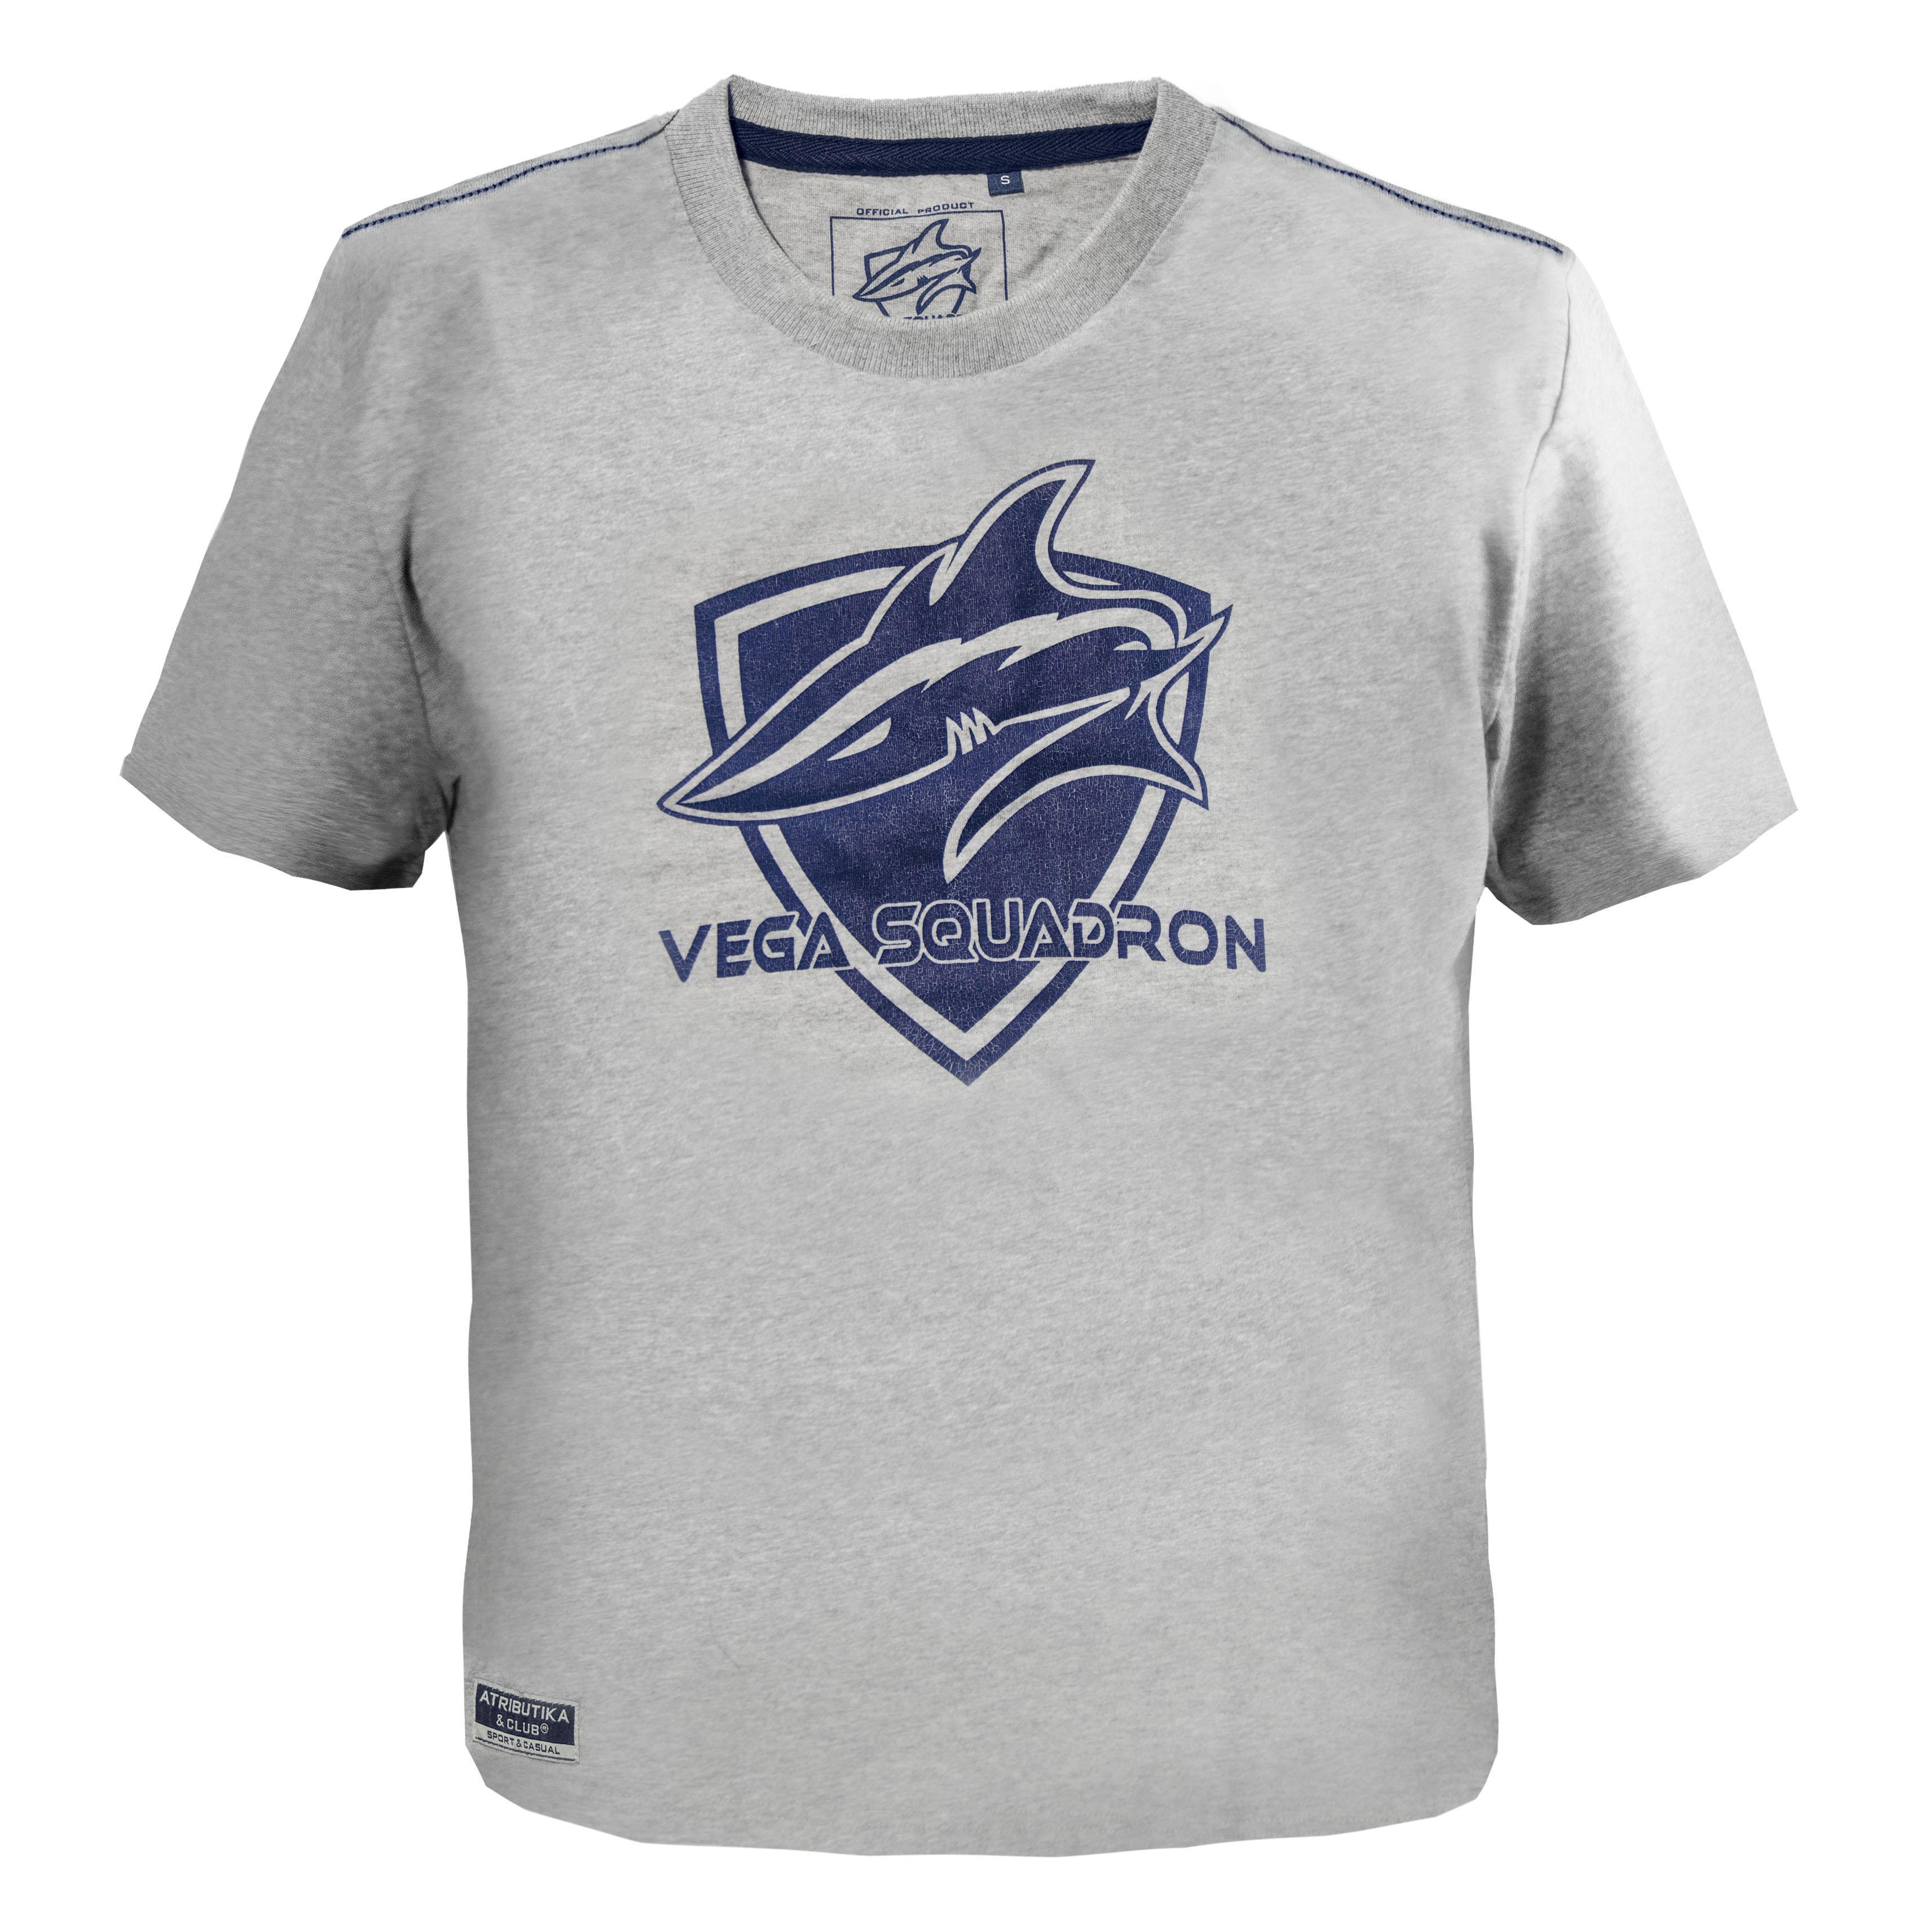 Футболка Vega Squadron 2019 (XS)